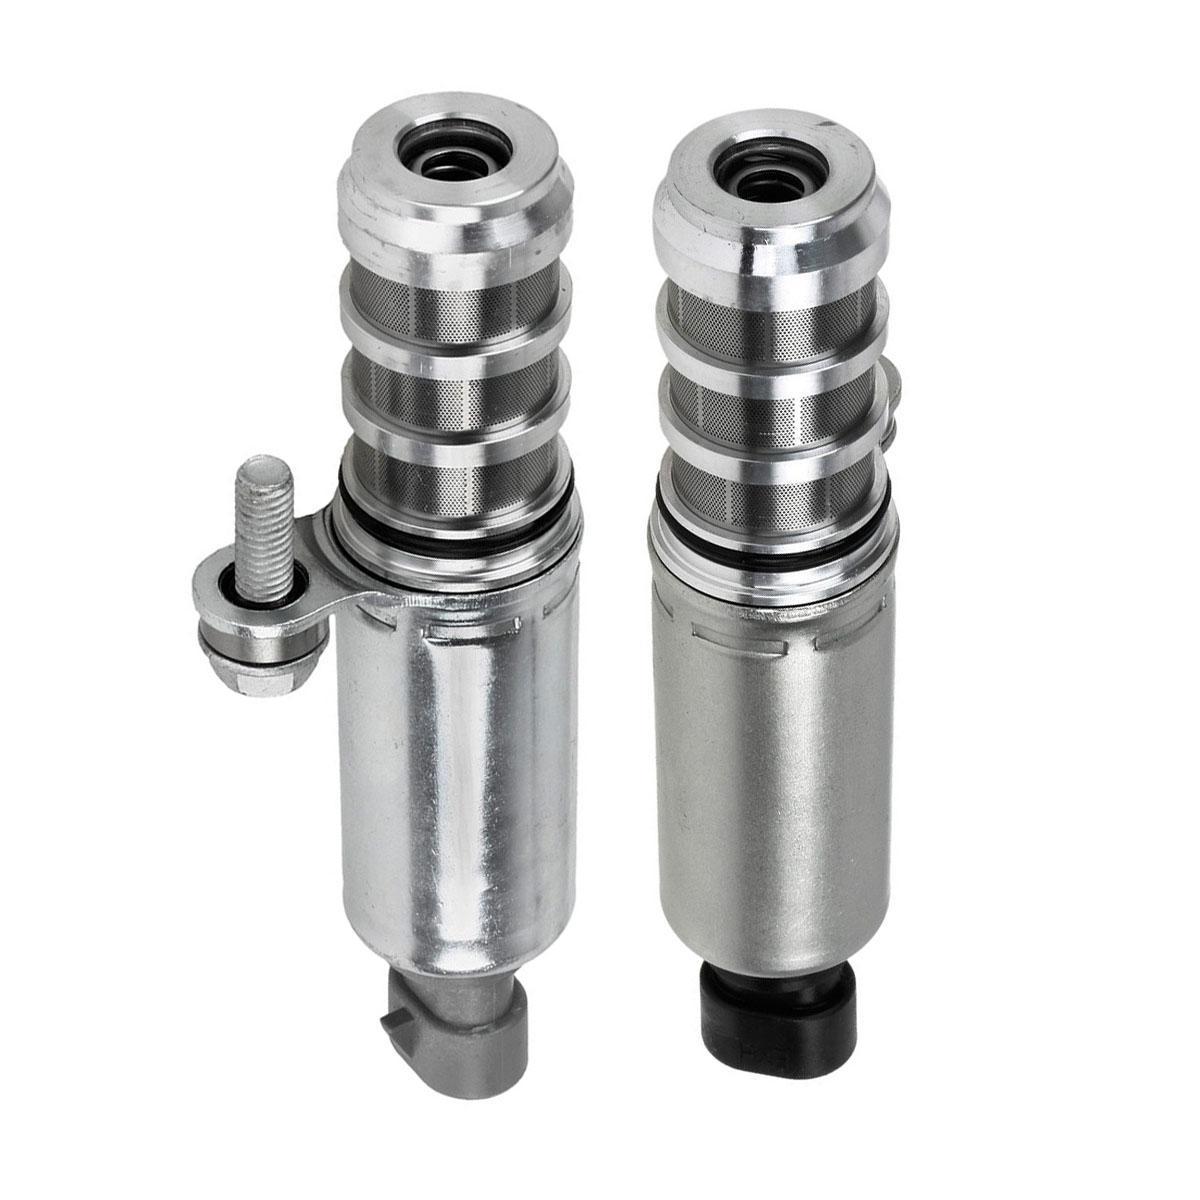 Intake & Exhaust Camshaft Position Actuator VVT Solenoids